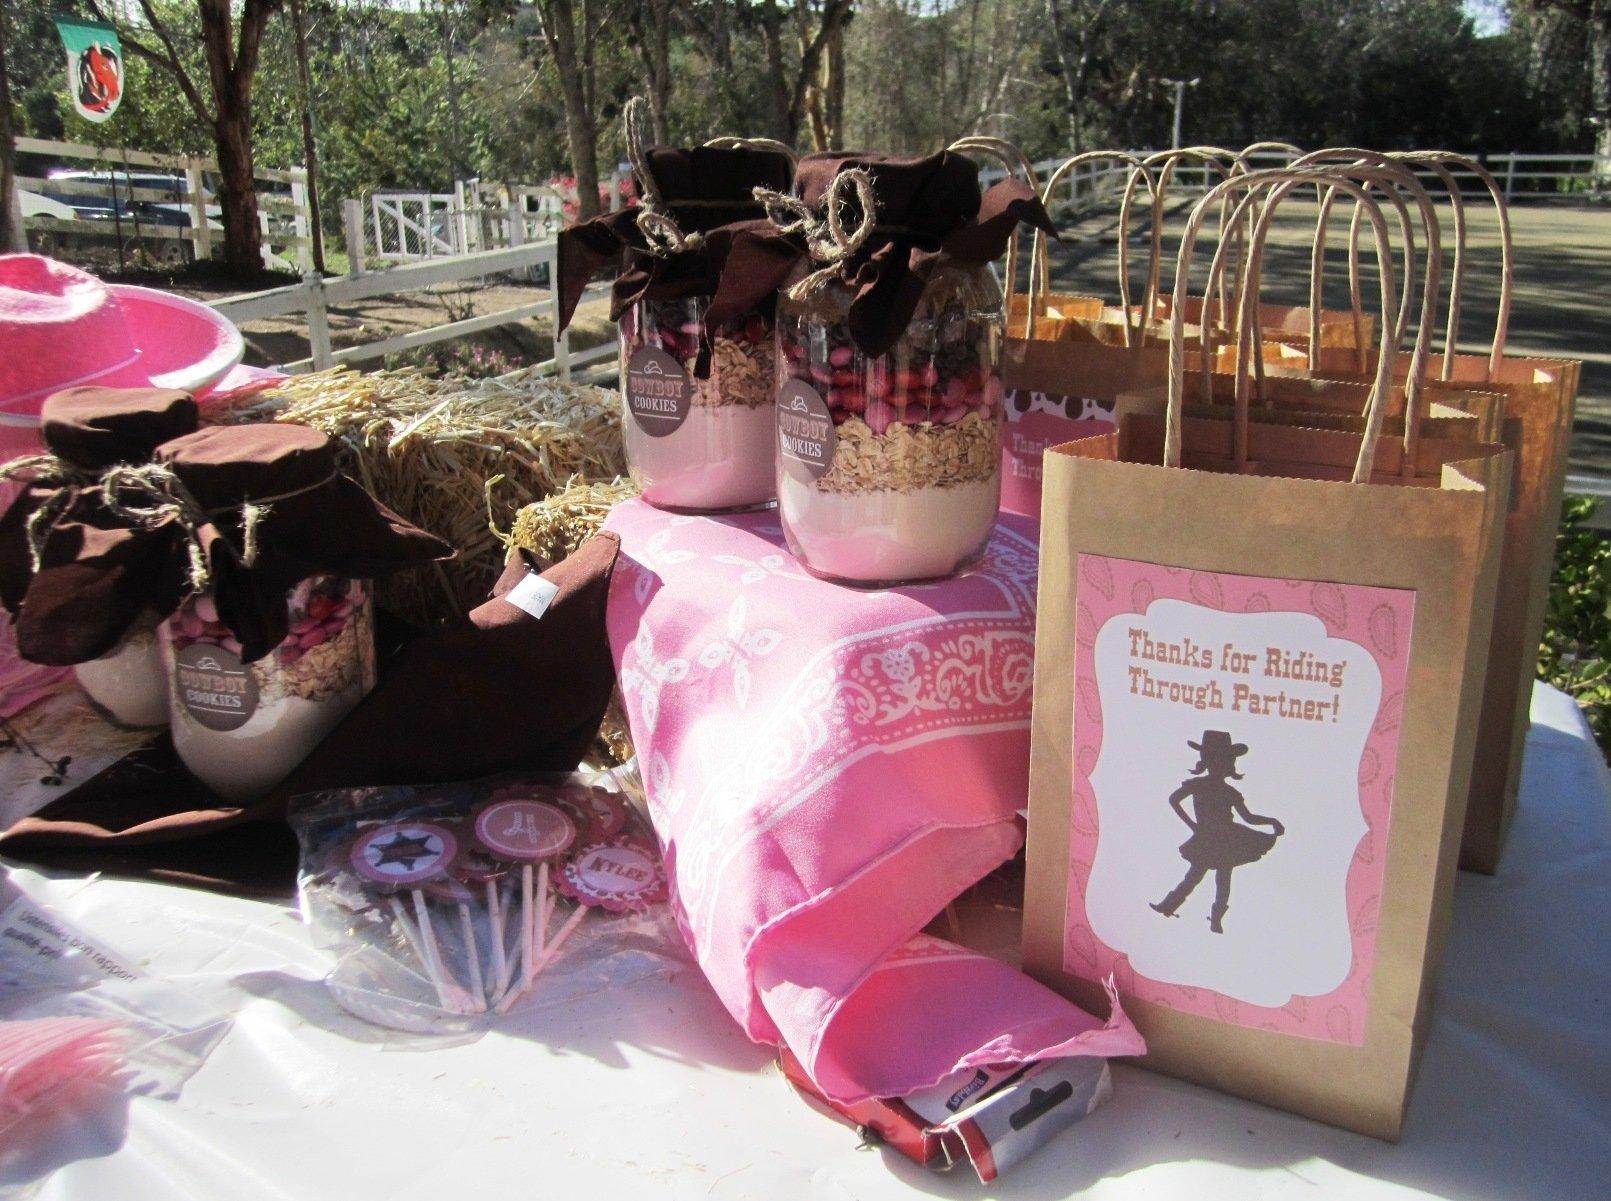 10 Stylish Horse Themed Birthday Party Ideas birthday party ideas san diego mega arte riding academy blog 3 2020